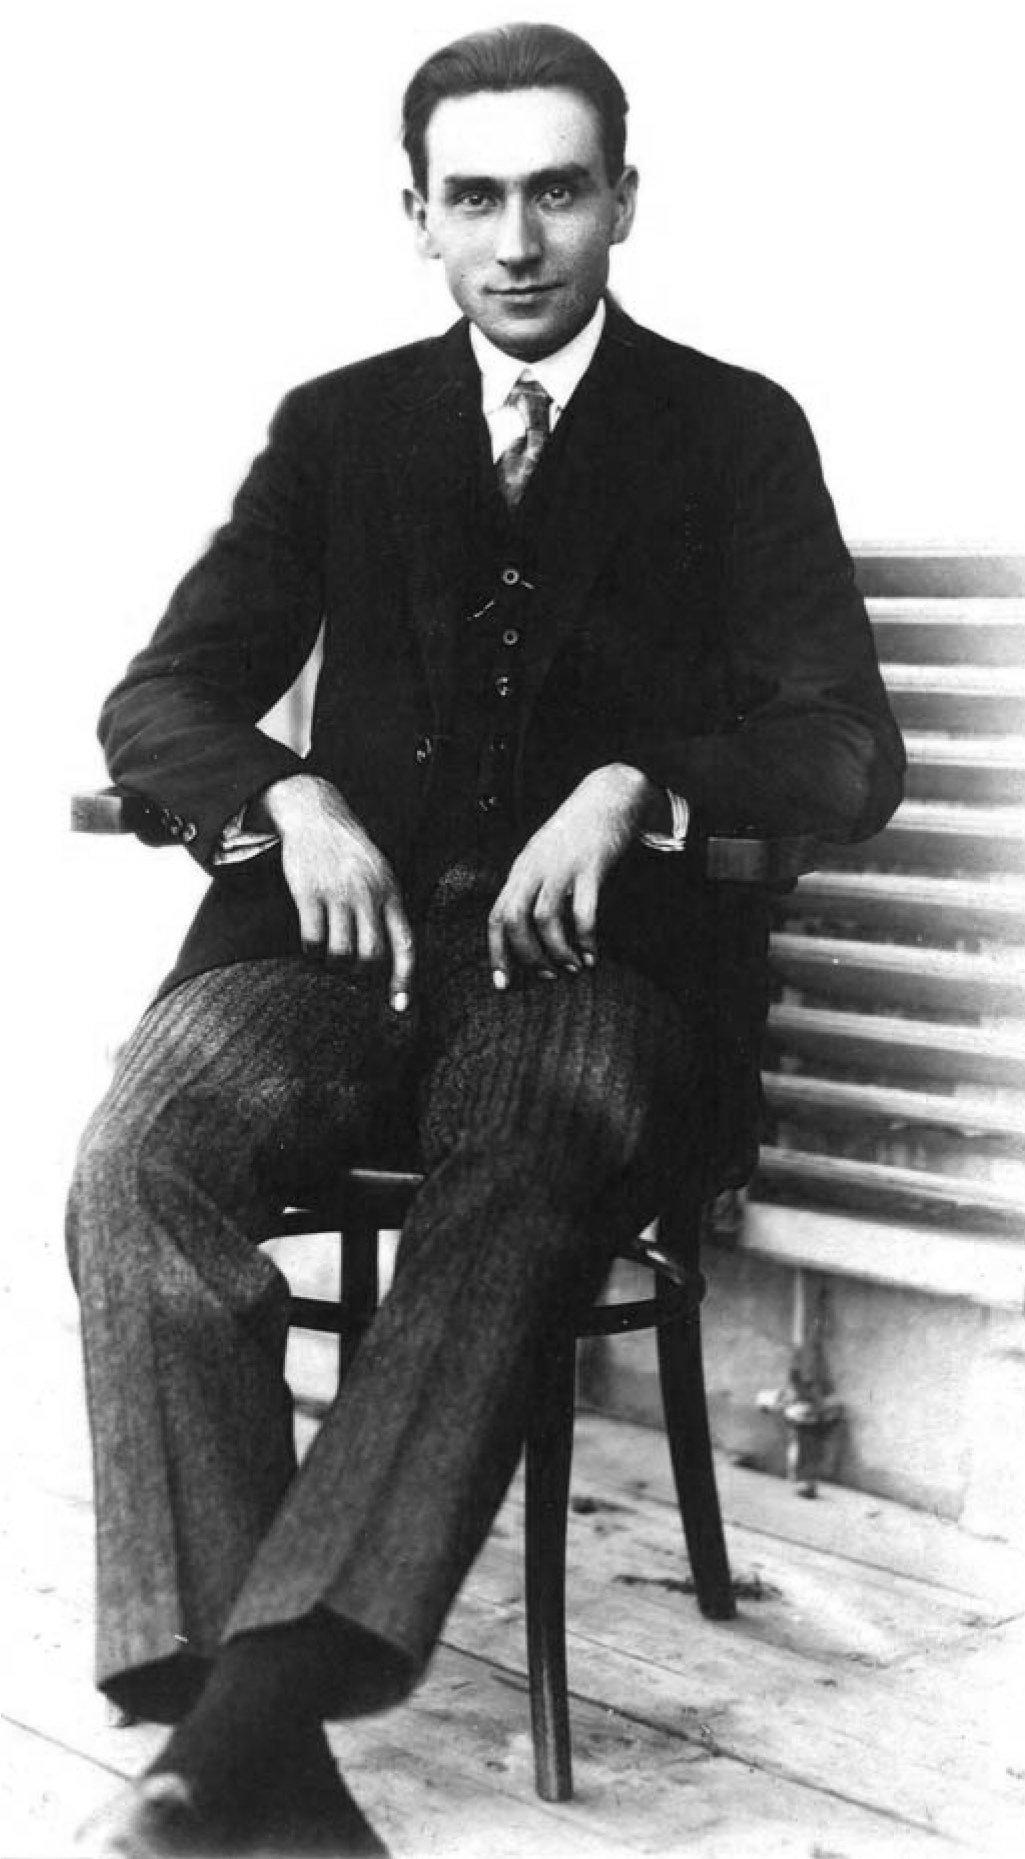 Ahmet Hamdi Başar photographed in the 1920s.